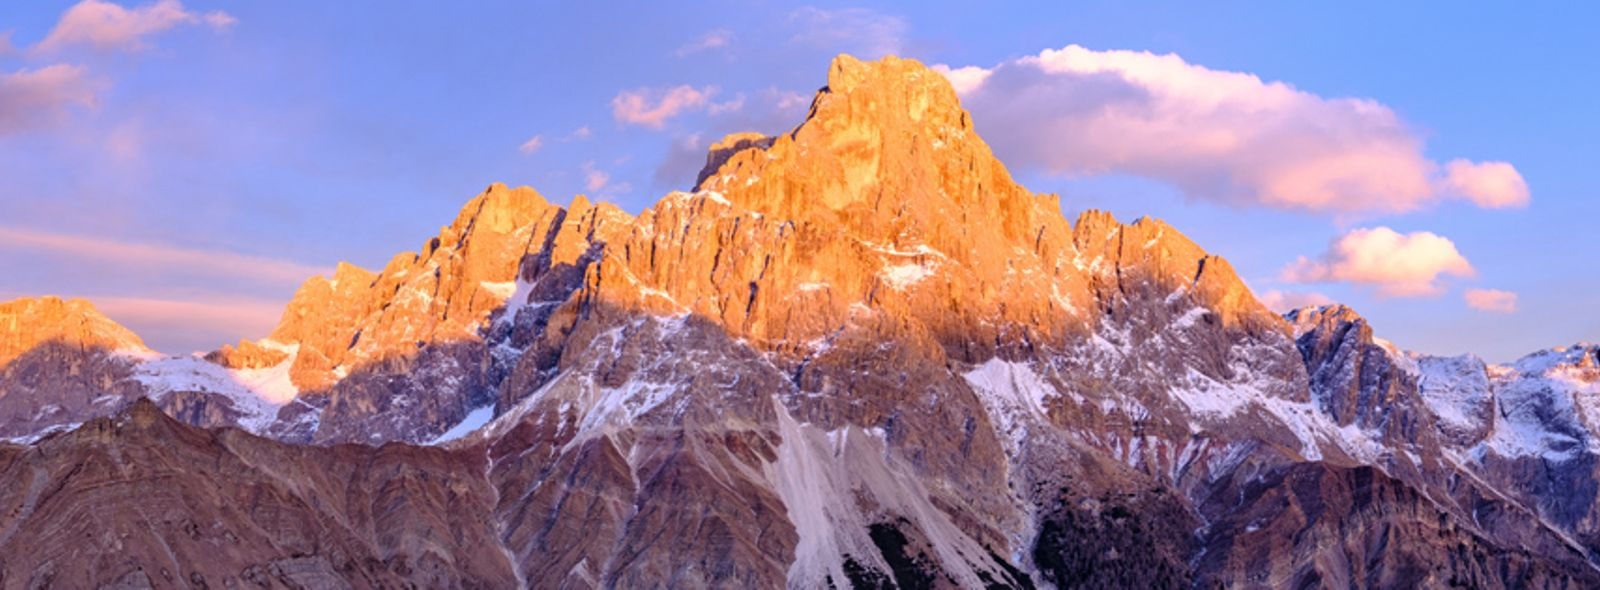 Dolomiti: le montagne